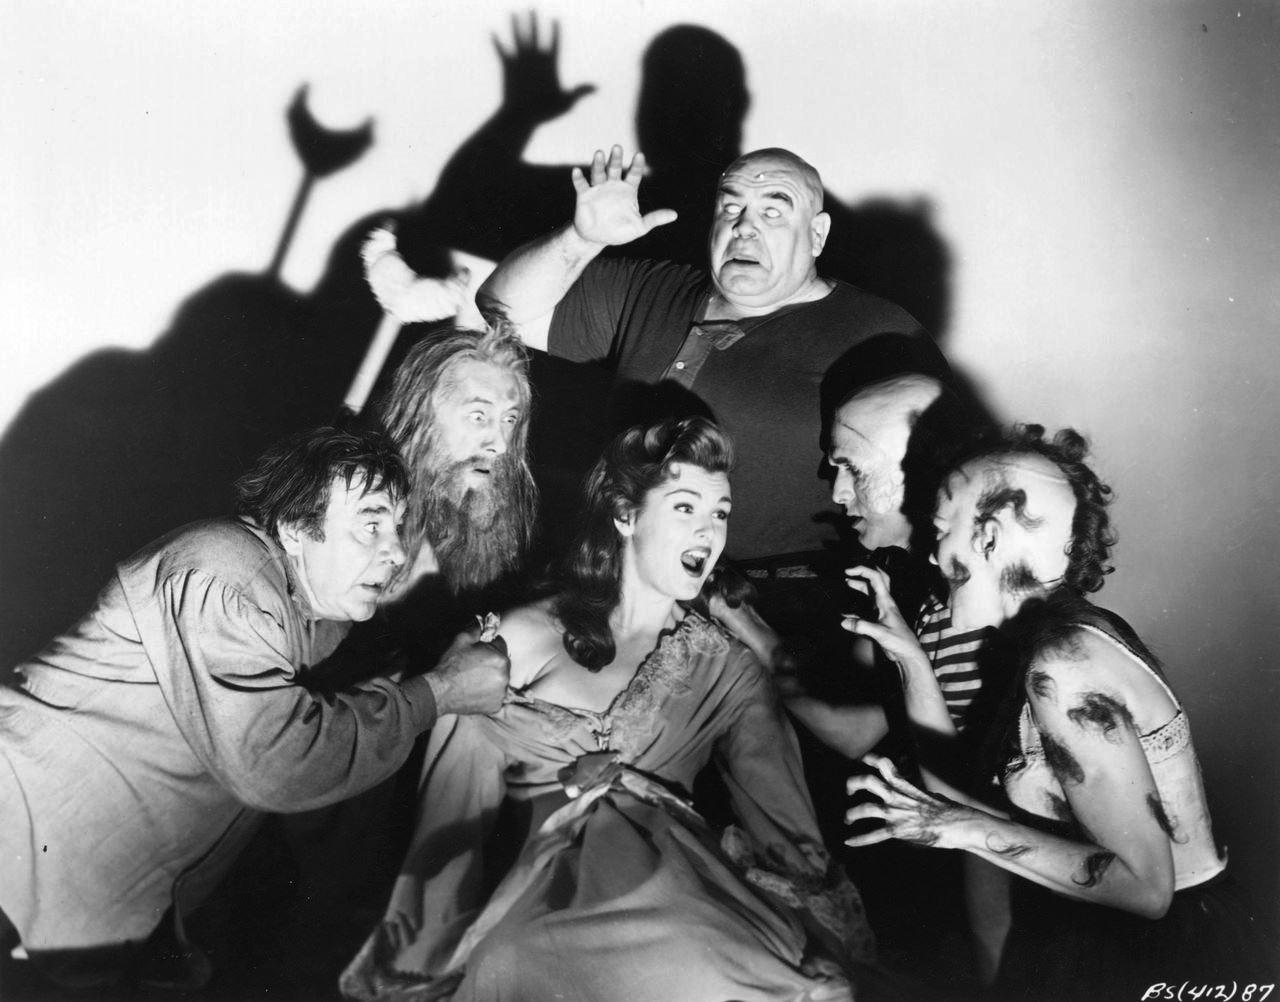 The deformities crowd in around Patricia Blake - (clockwise from left) Lon Chaney Jr, John Carradine, Tor Johnson, George Sawaya and Claire Carleton in The Black Sleep (1956)